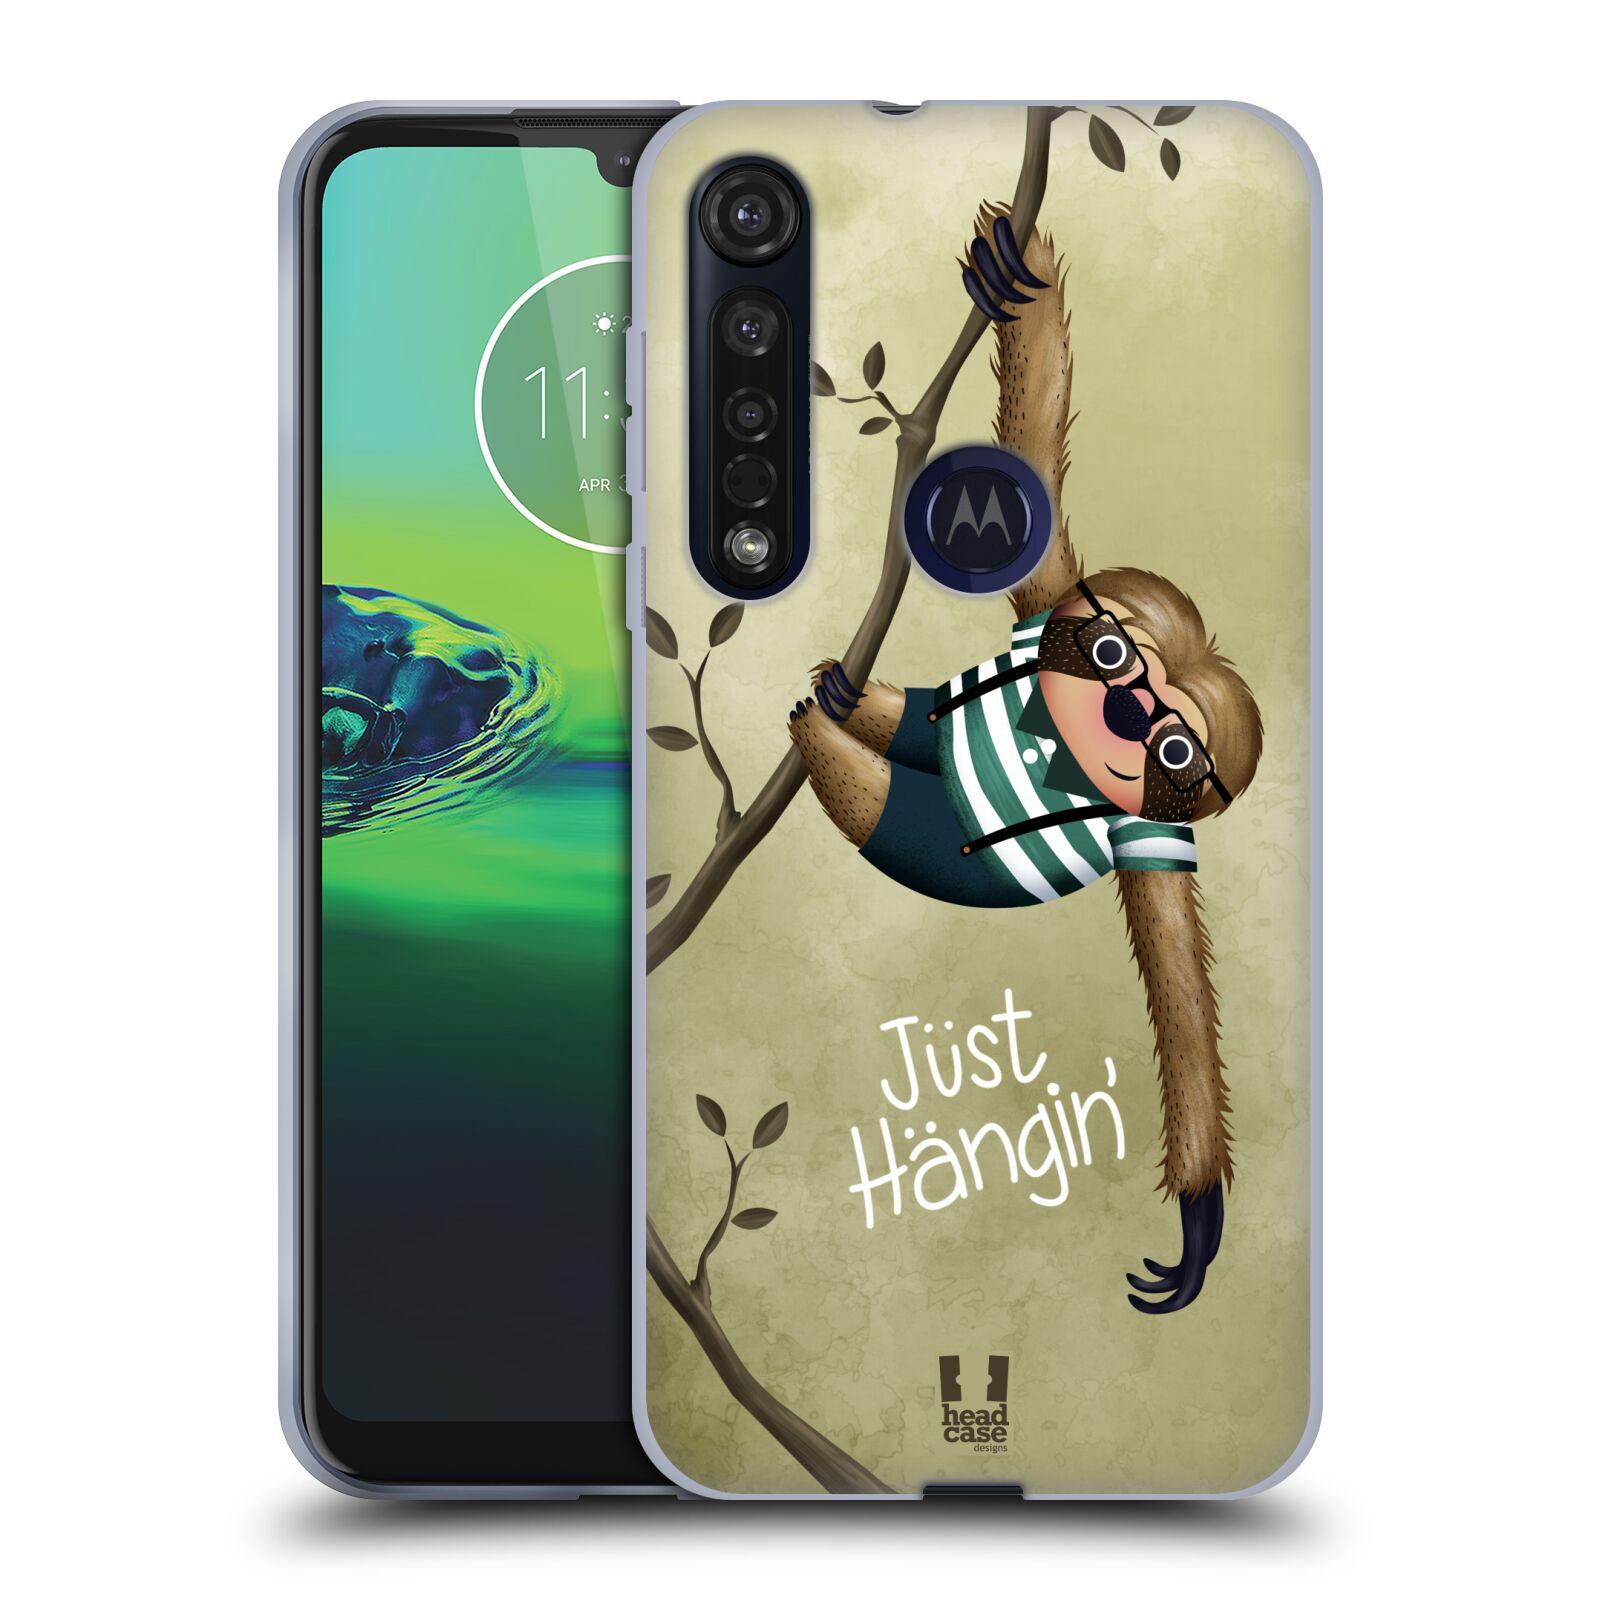 Silikonové pouzdro na mobil Motorola Moto G8 Plus - Head Case - Lenochod Just Hangin